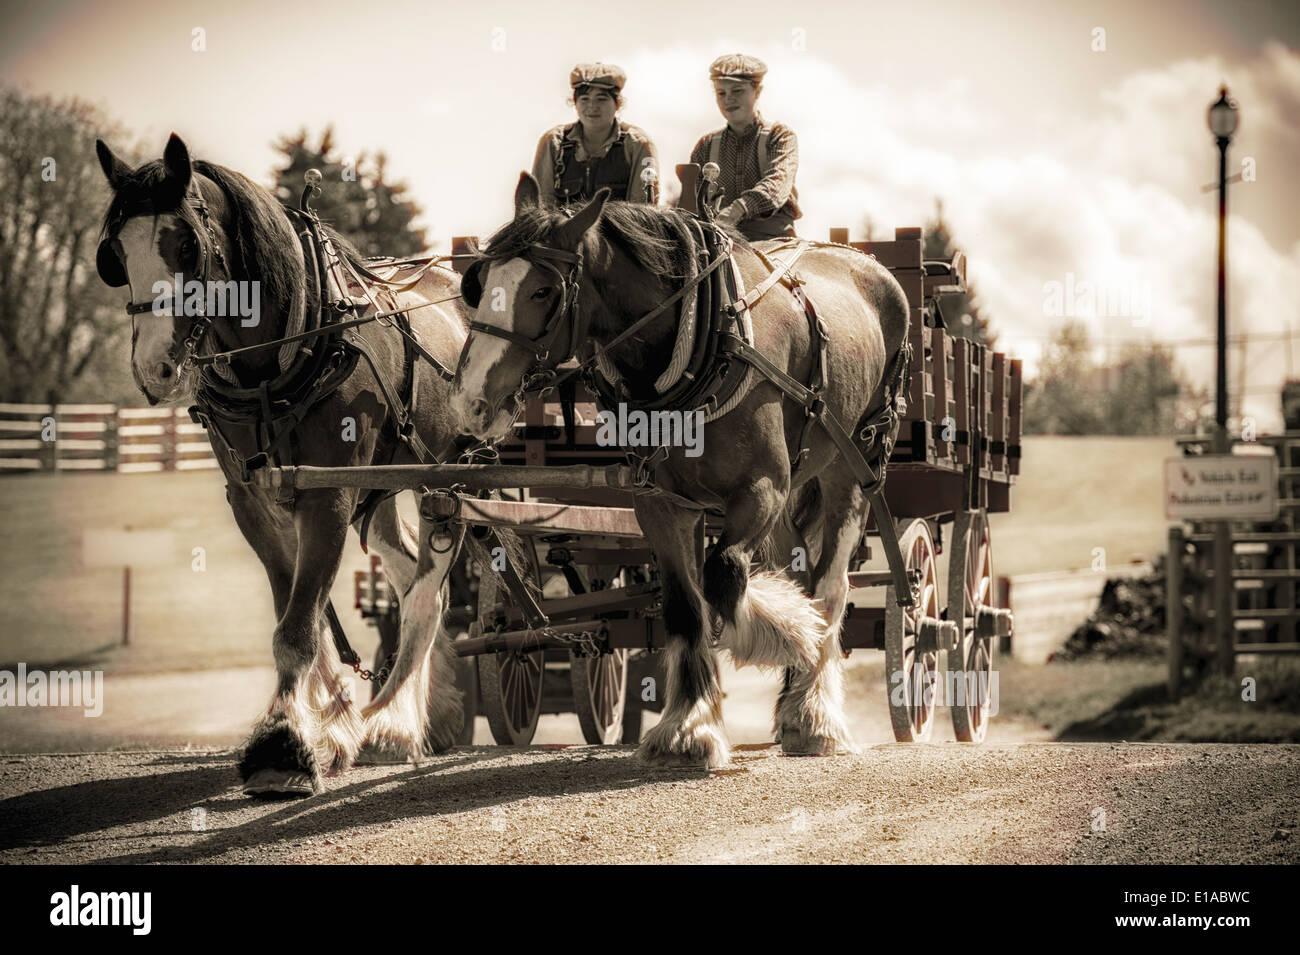 draft-horses-pulling-a-wagon-at-heritage-park-in-calgary-alberta-canada-E1ABWC.jpg